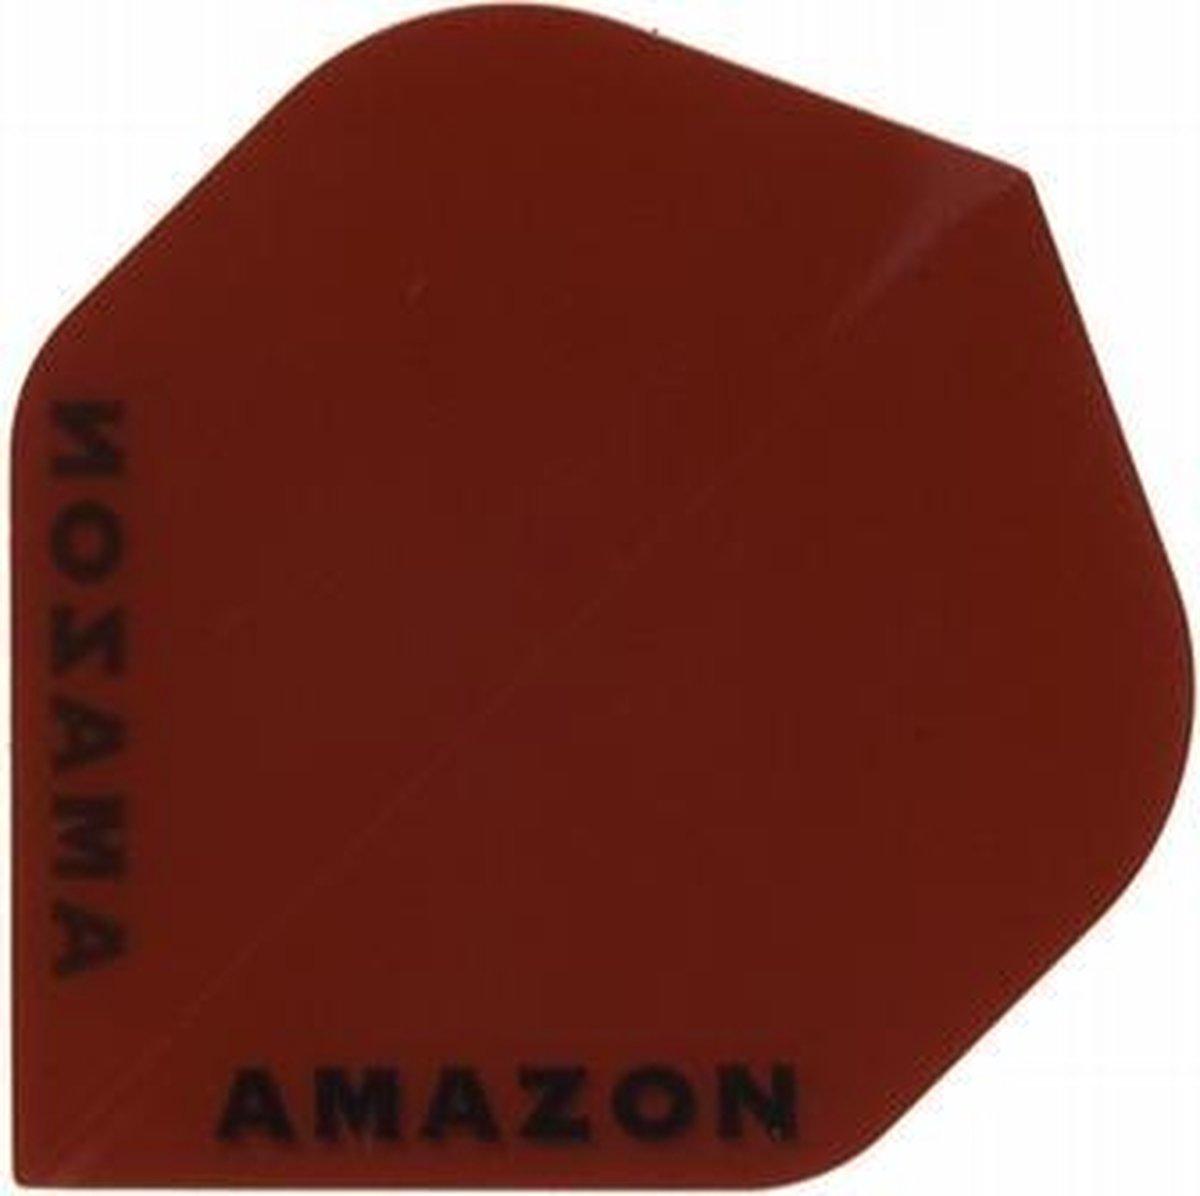 5 sets (15 stuks) Ruthless flights Amazon Transparant Std Red